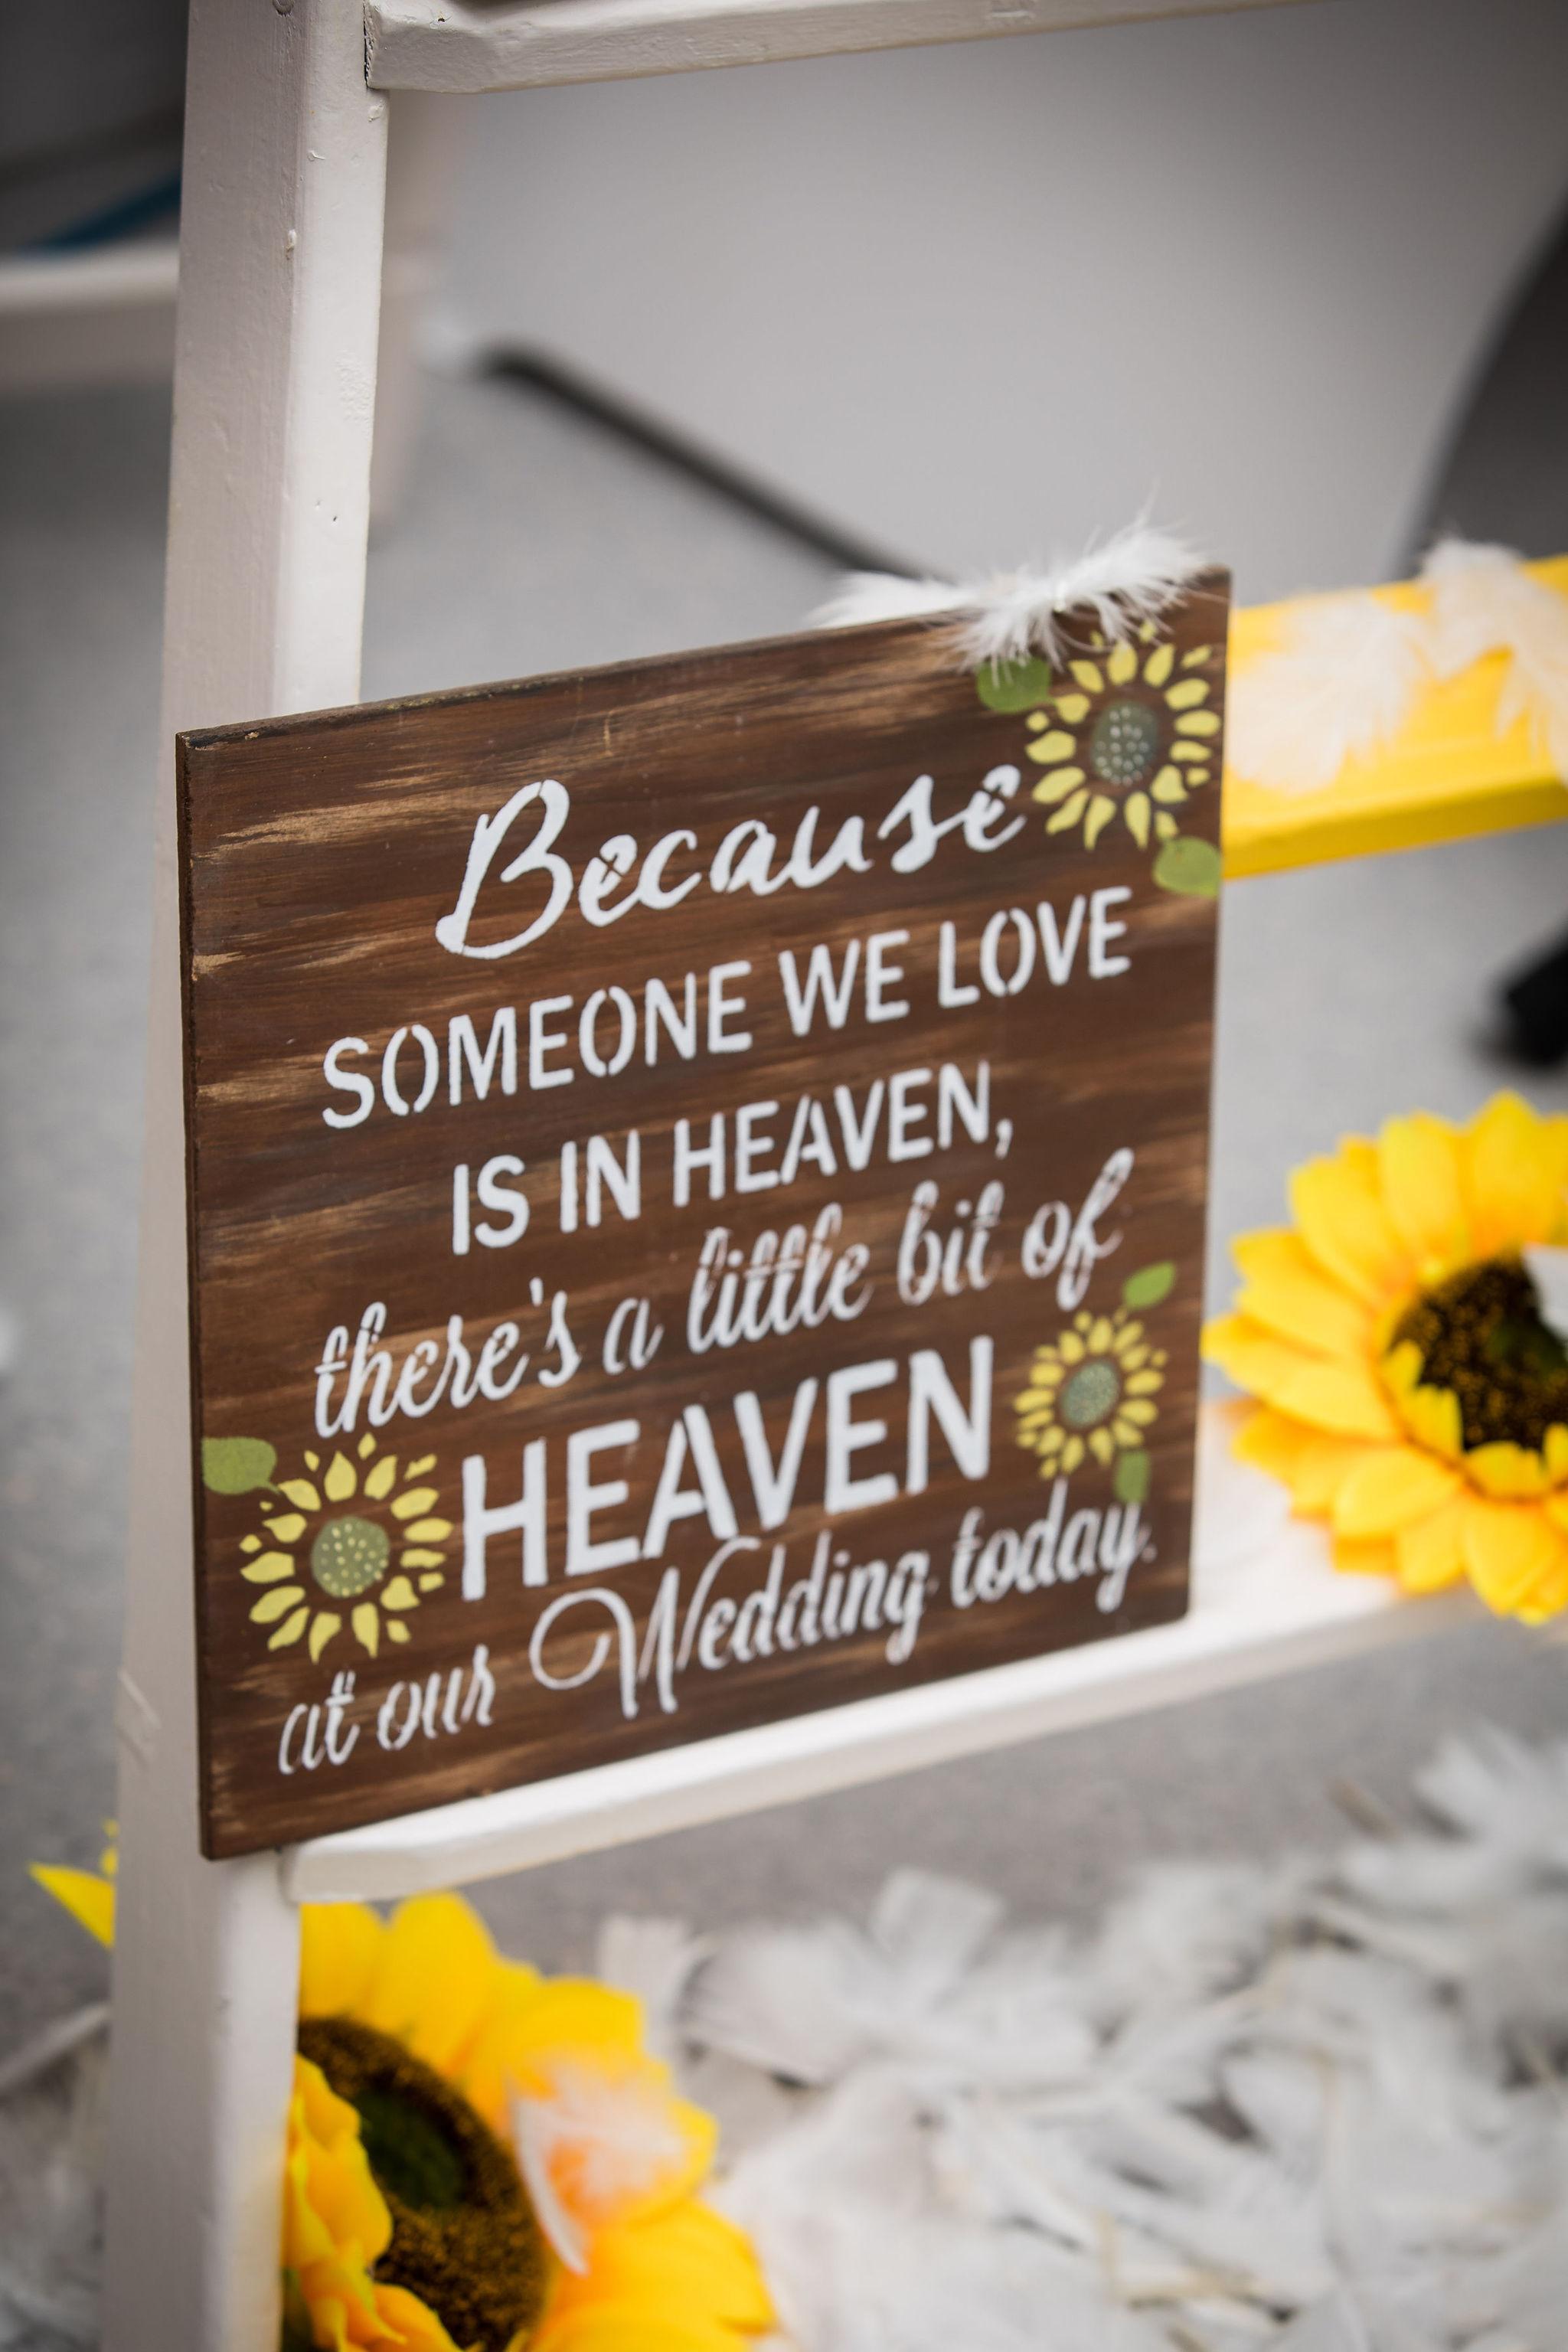 Harriet&Rhys Wedding - someone in heaven sign